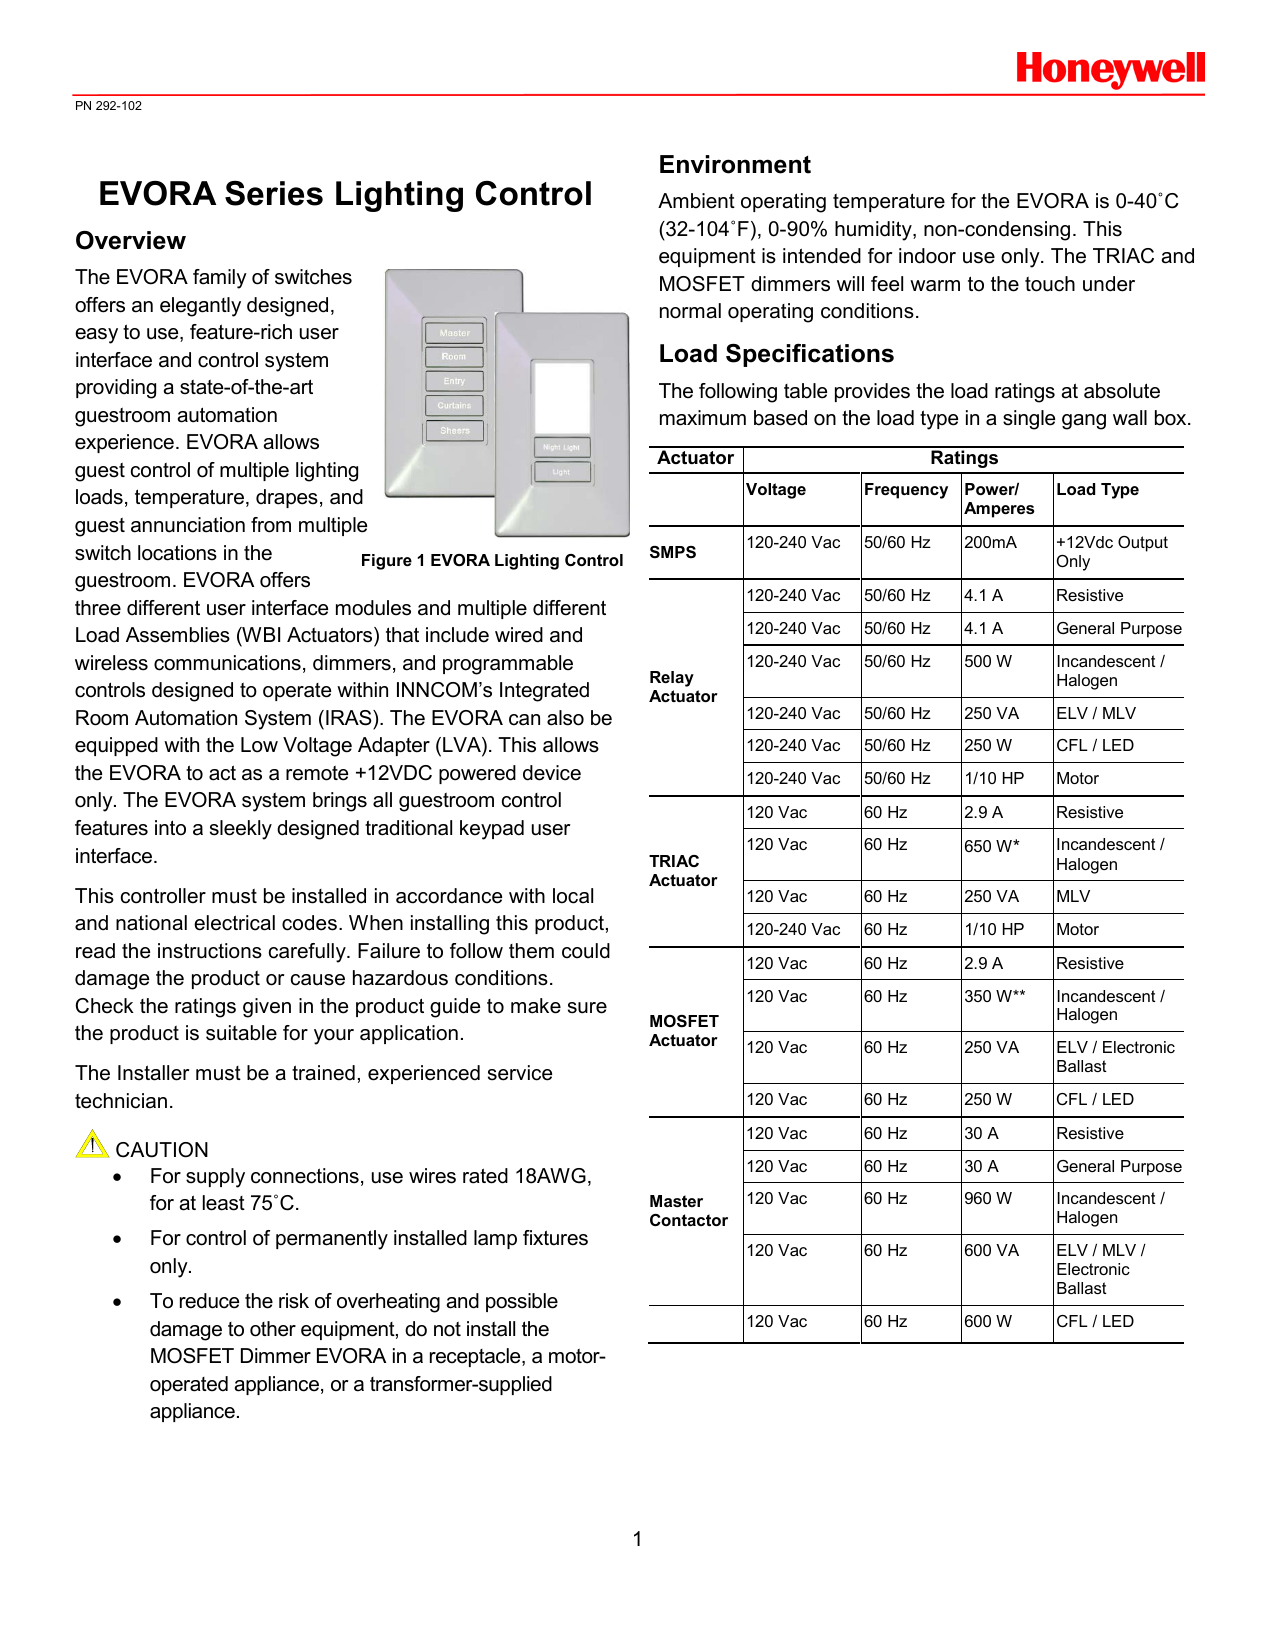 EVORA Installation Guide